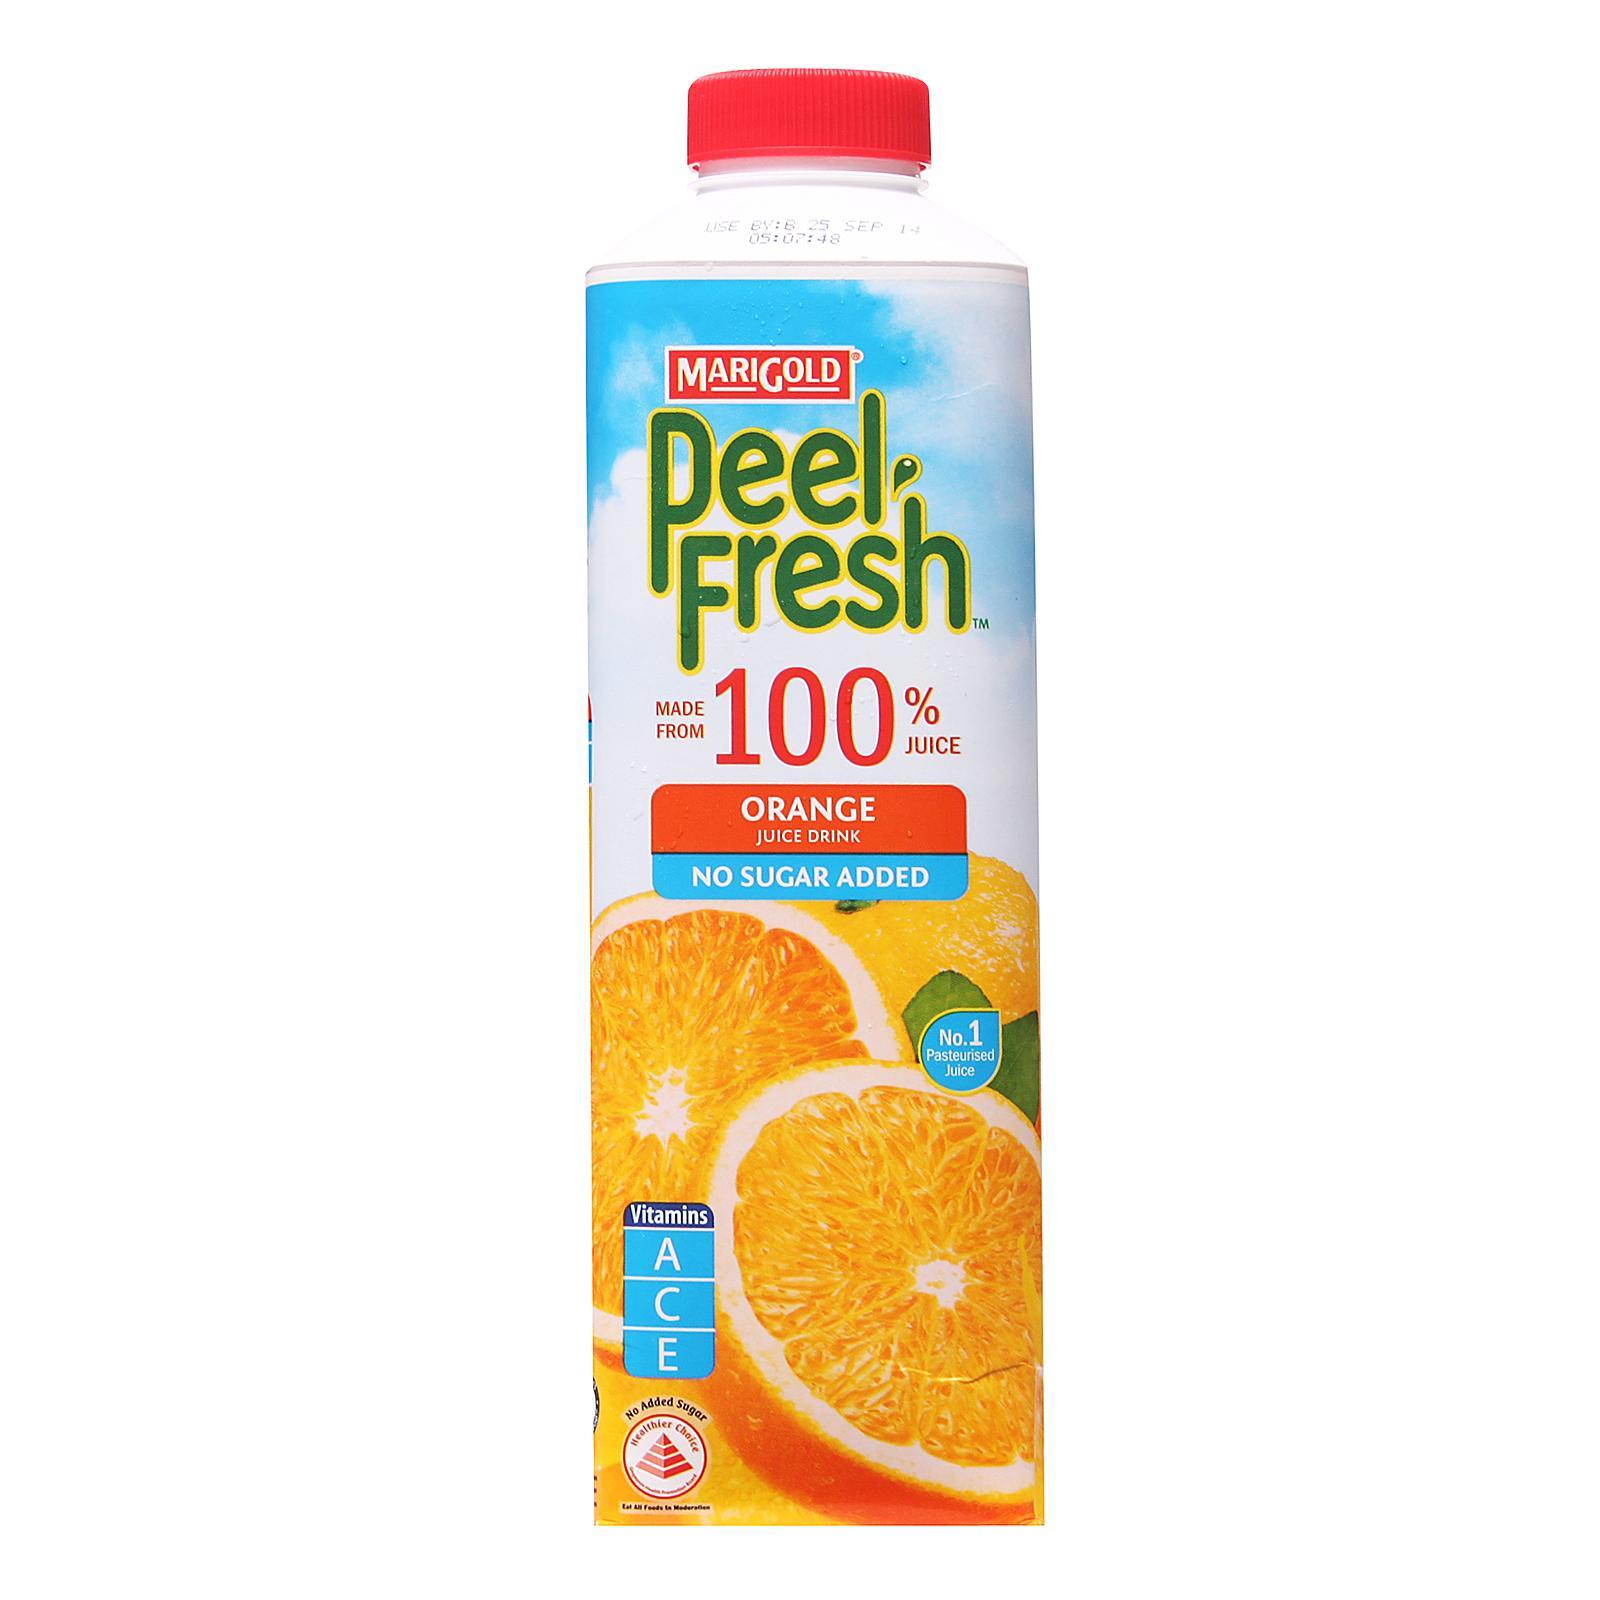 MARIGOLD PEEL FRESH Orange Juice Drink - No Sugar Added 1L